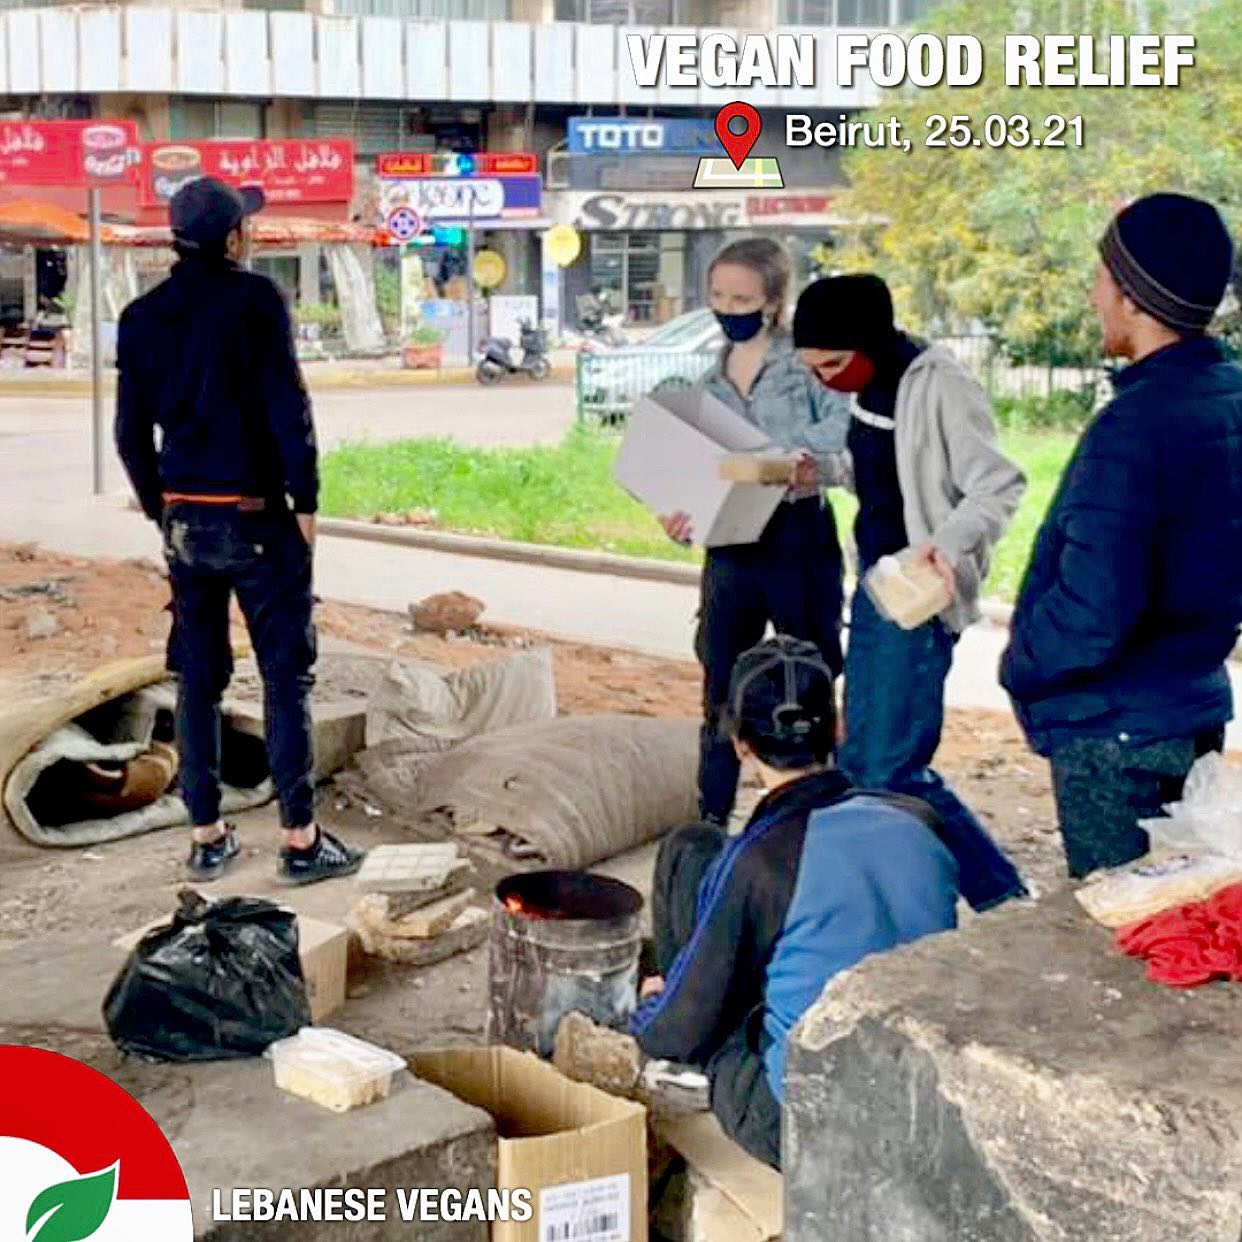 vegan-food-relief-program-lebanese-vegans